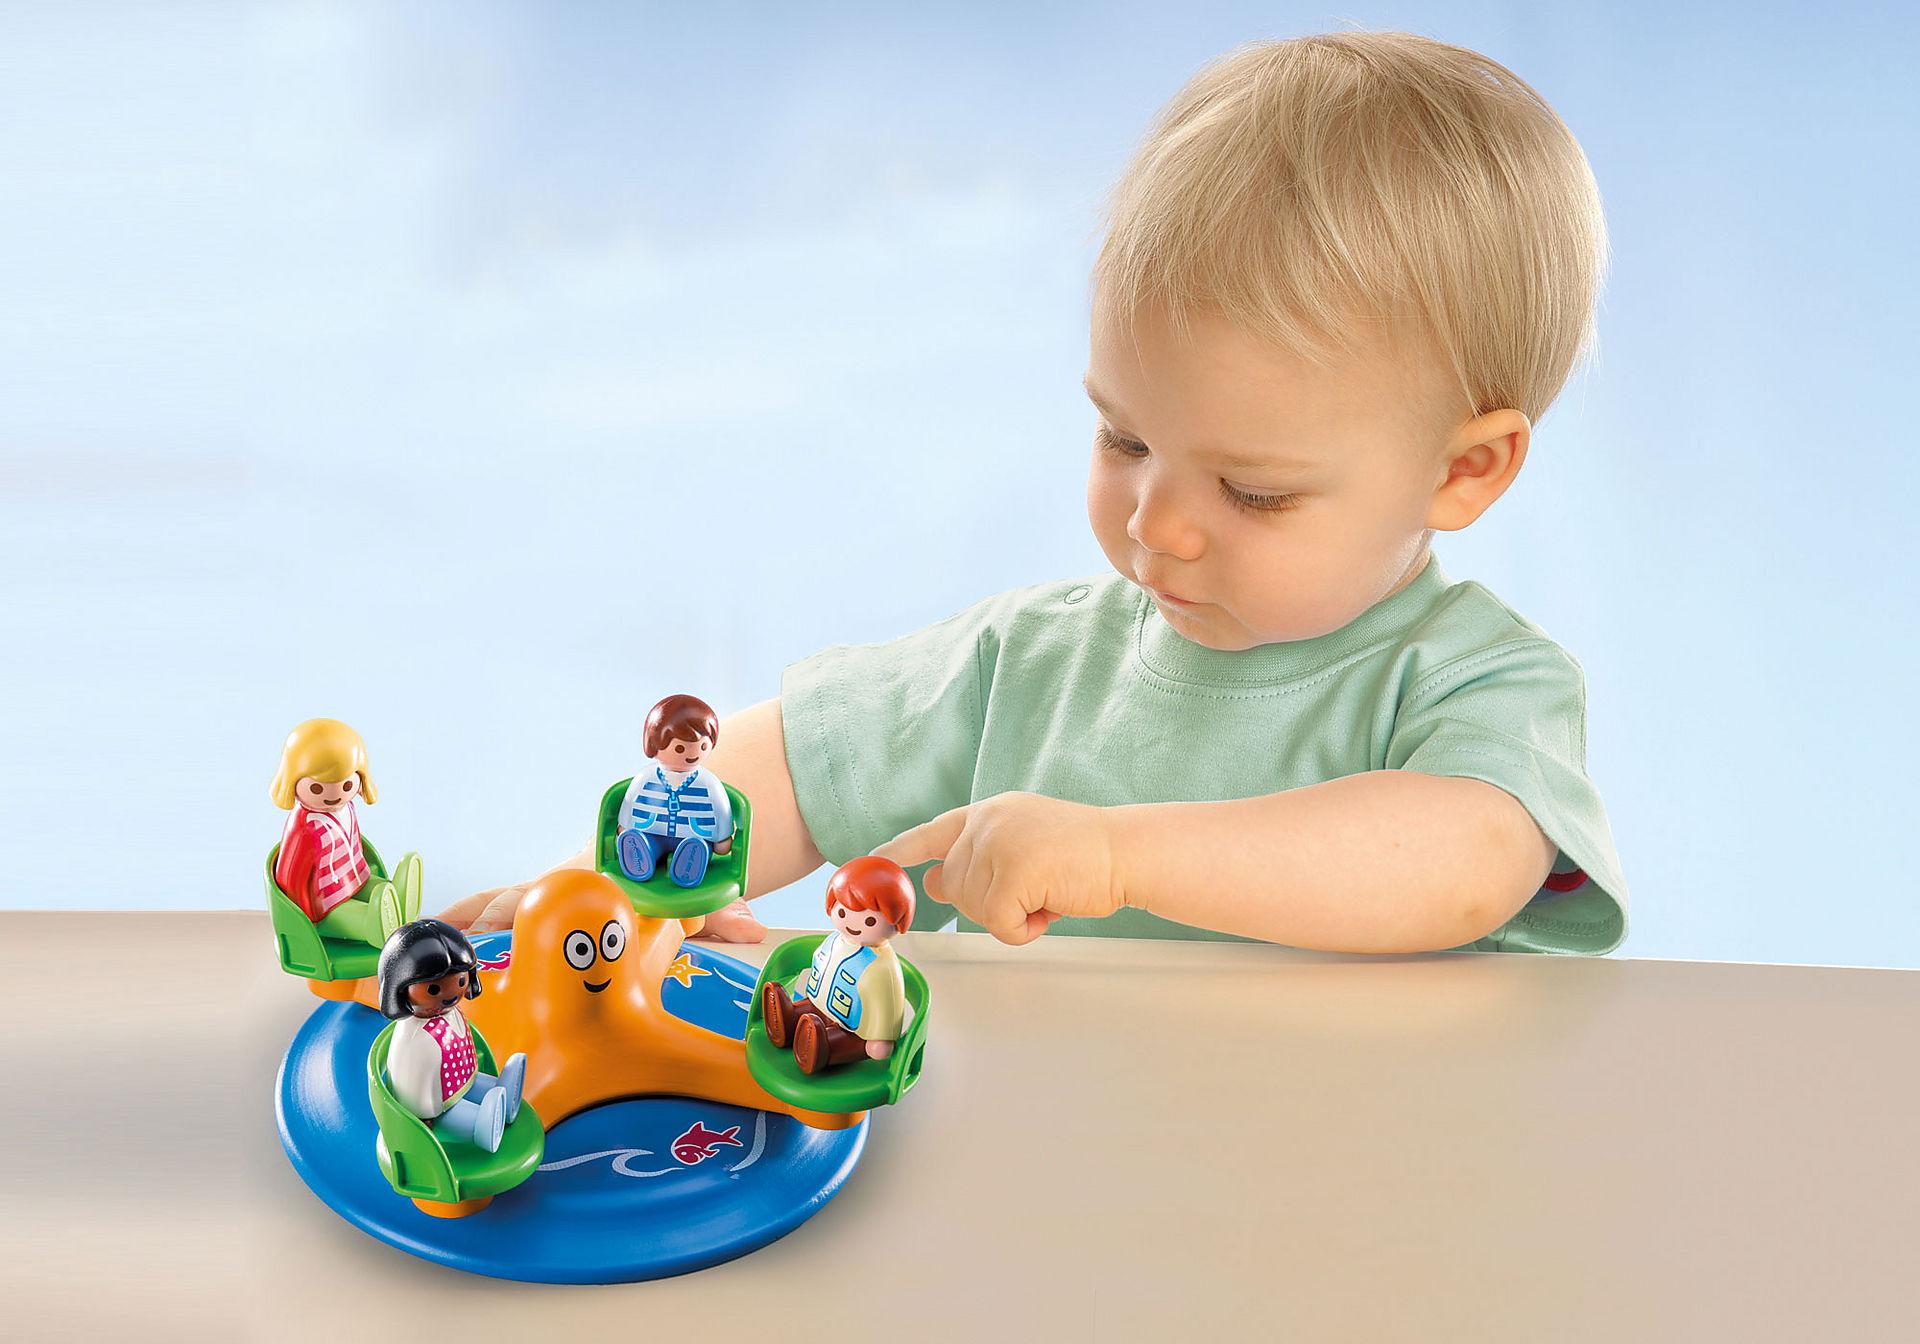 http://media.playmobil.com/i/playmobil/9379_product_extra1/1.2.3 Carrusel Infantil